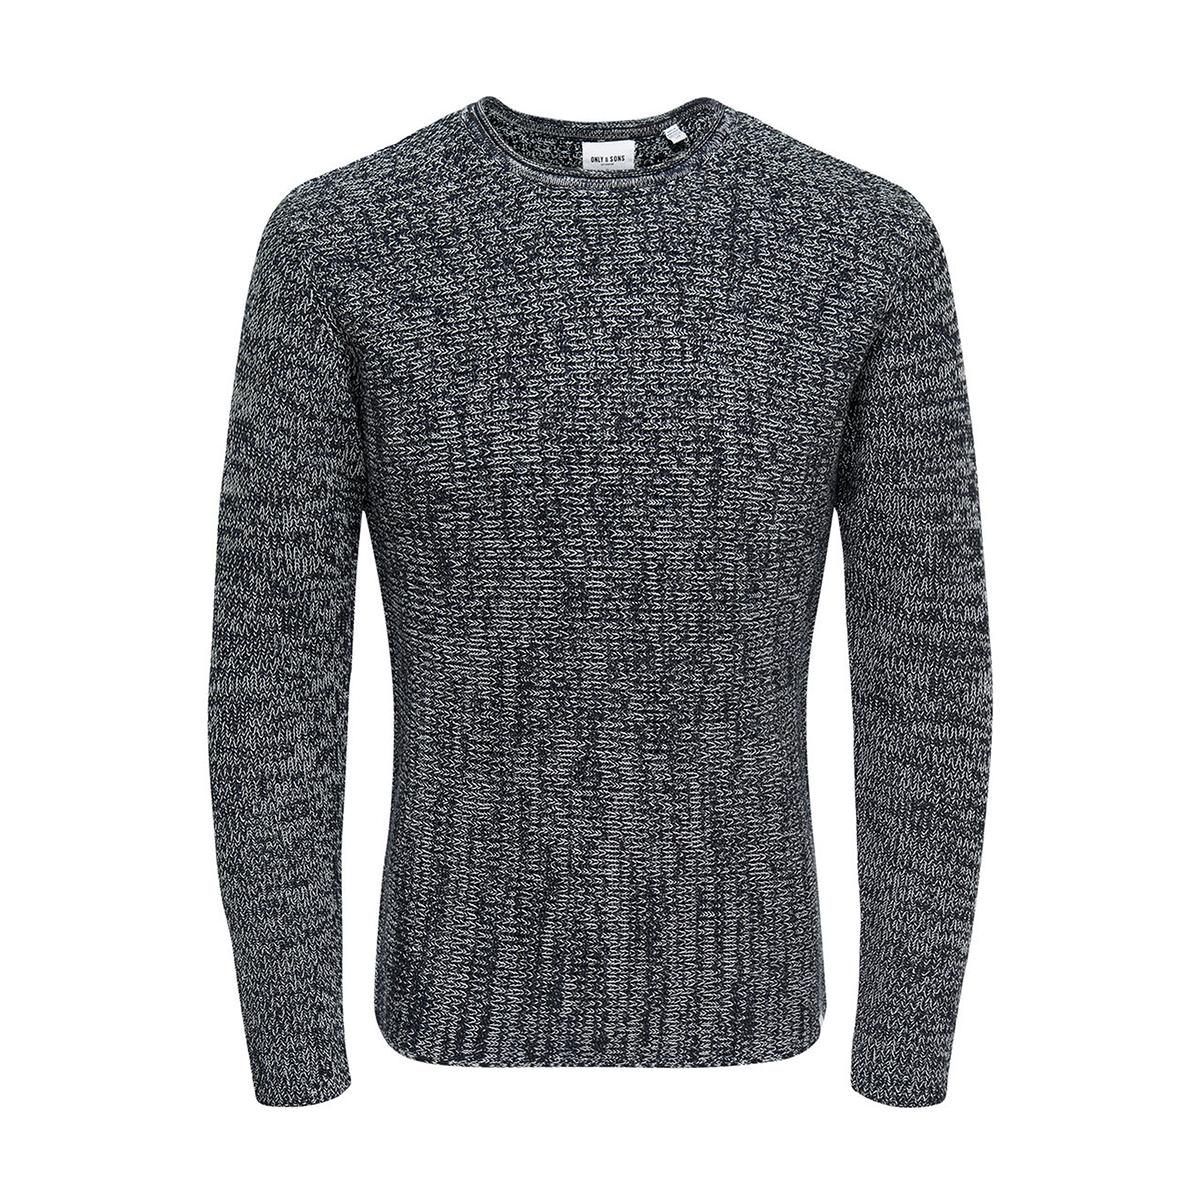 onssato 5 multi clr knit noos 22007296 only & sons trui dress blue/melange